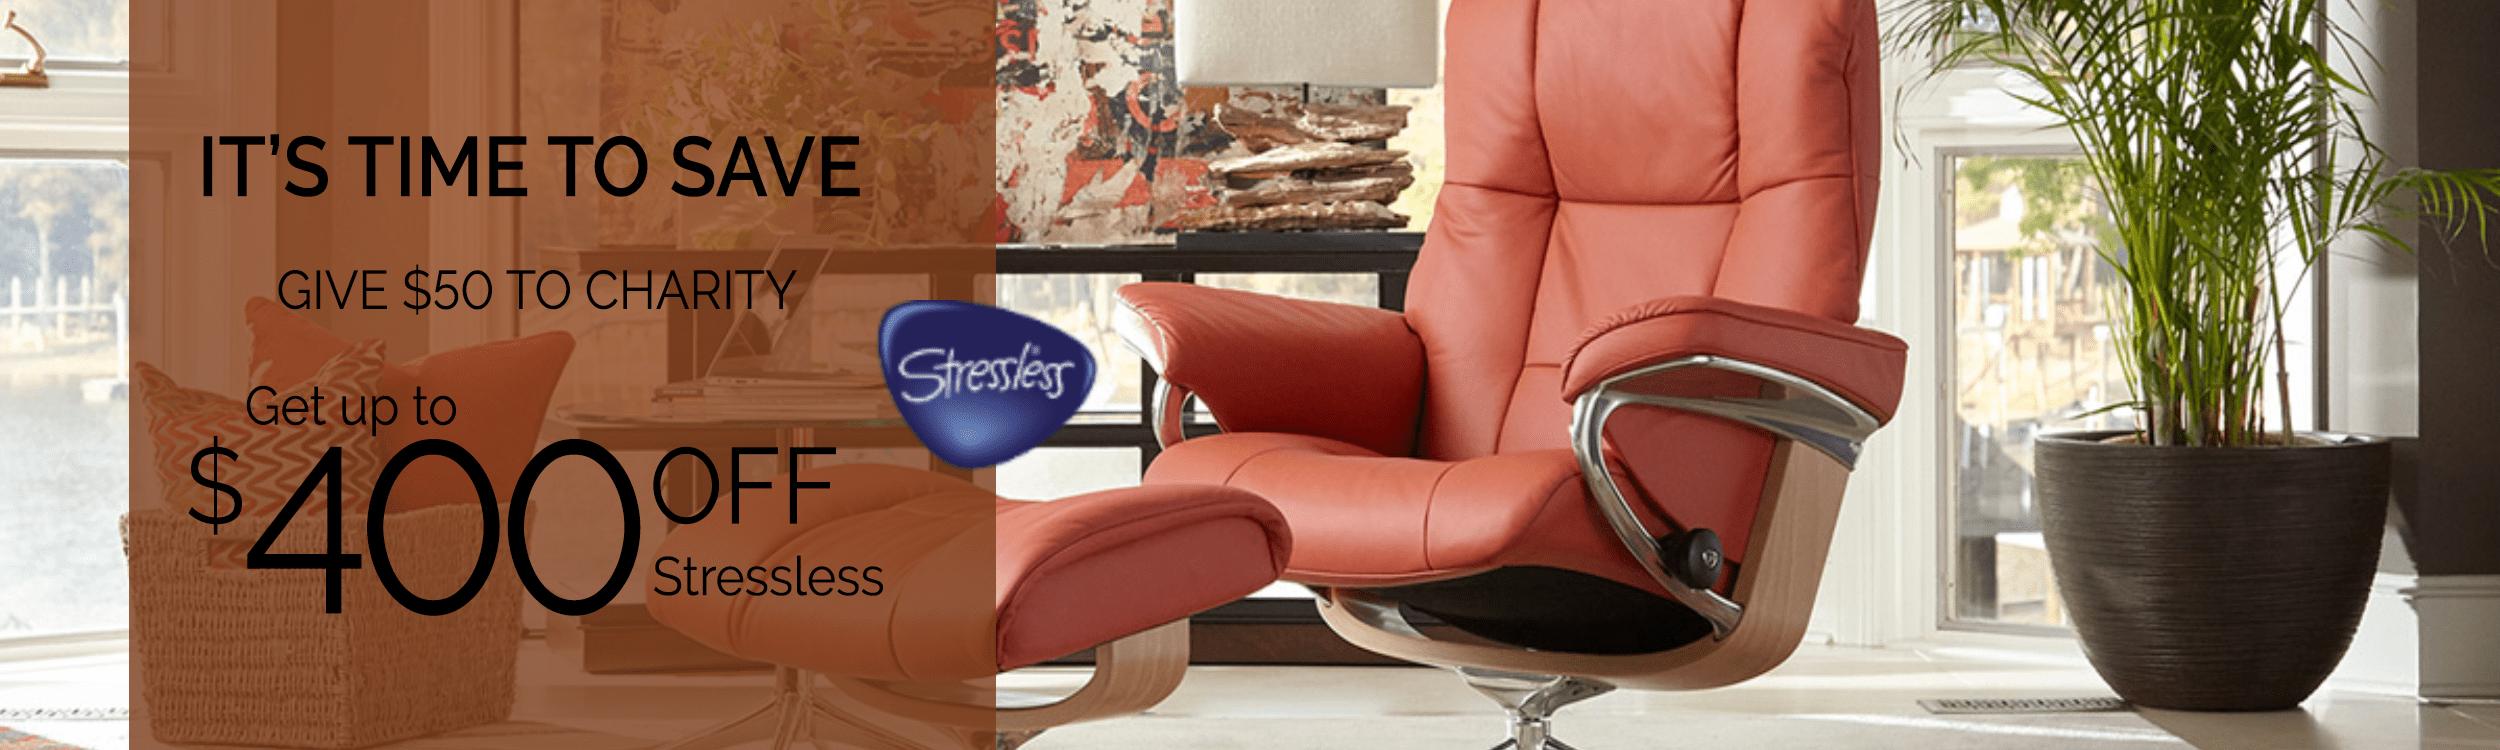 Fabulous Modern Furniture Store In Raleigh North Carolina Inzonedesignstudio Interior Chair Design Inzonedesignstudiocom